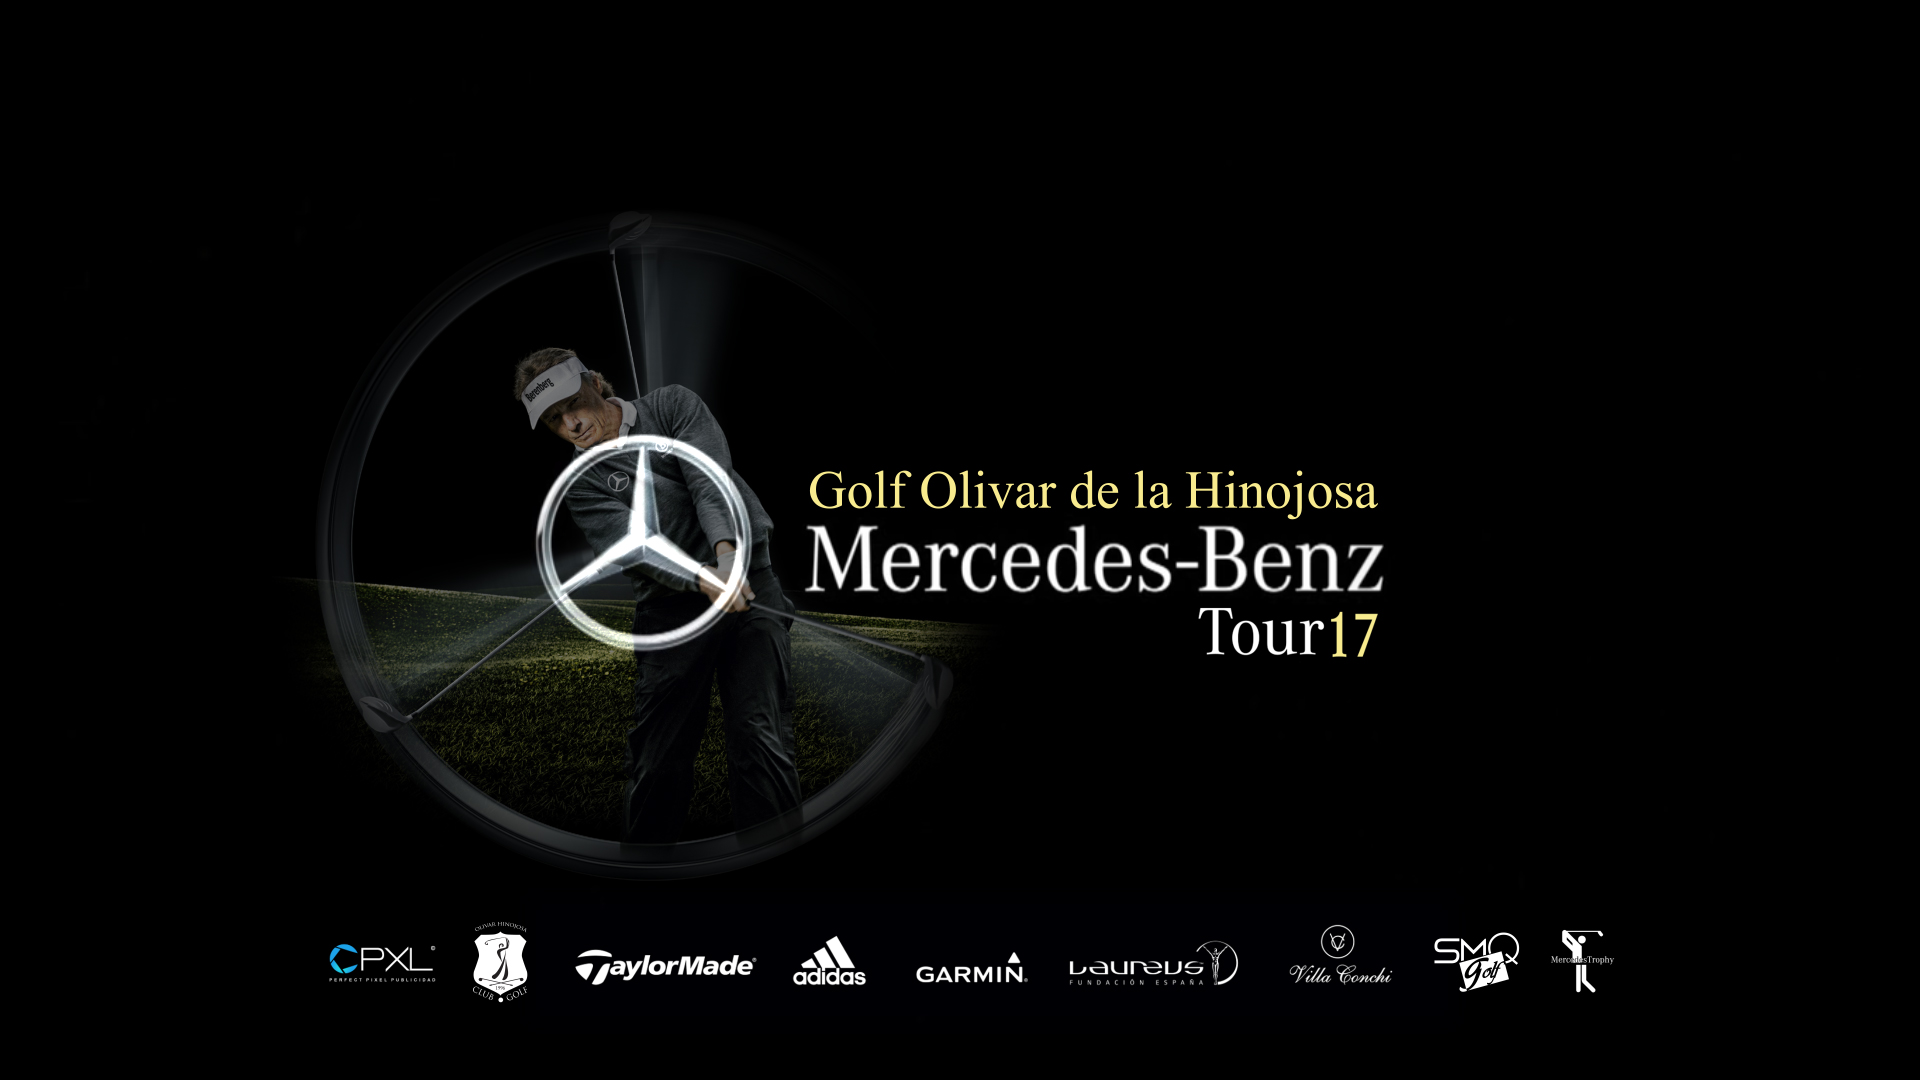 Torneo Mercedes Trophy (Tour17 amateur) - Golf Olivar de la Hinojosa (Sabores mas que Golf - grupo de restauracion y eventos)